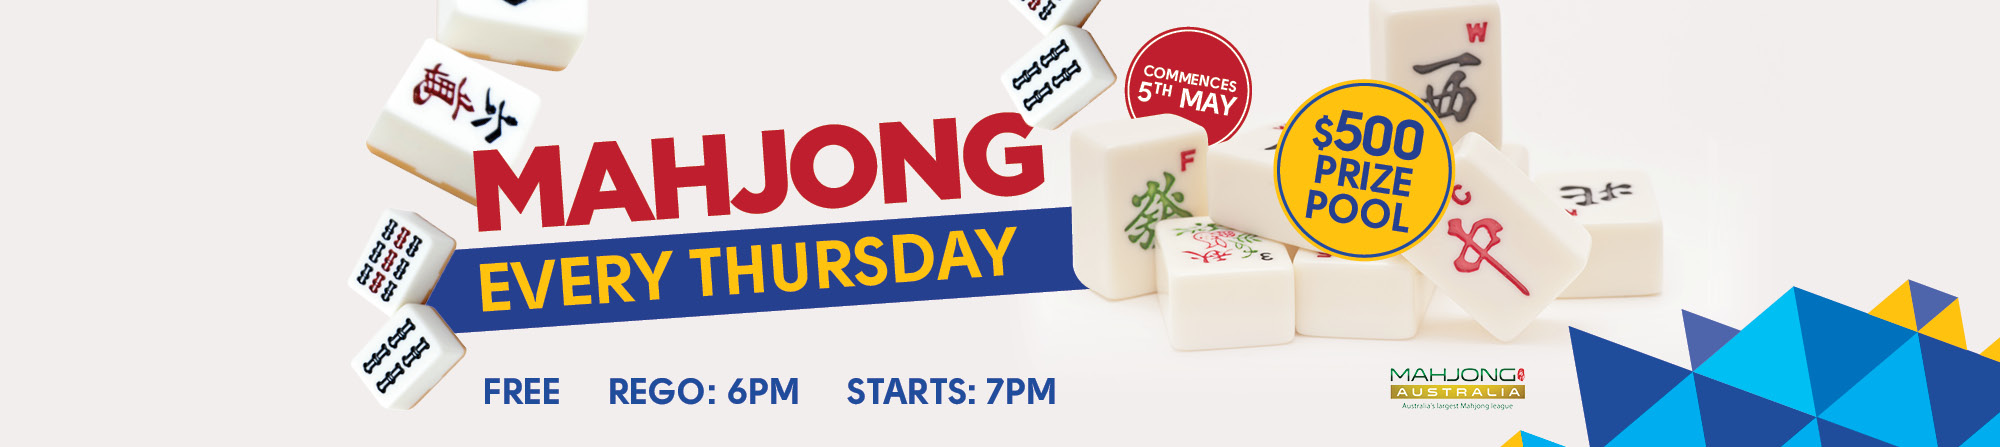 MAHJONG-THURSDAY_Slide-home-page